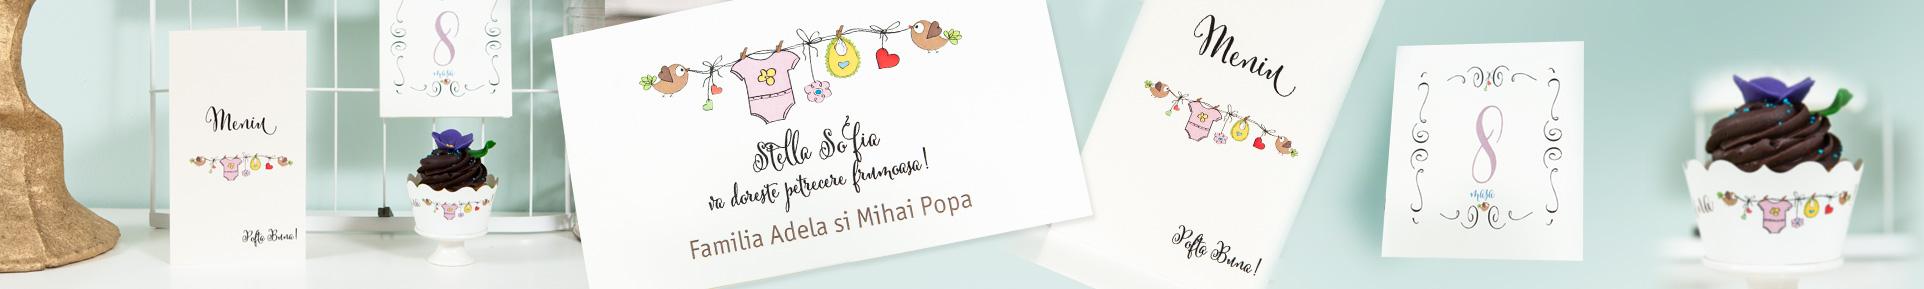 Texte Pentru Invitatii De Botez Personalizeaza Online